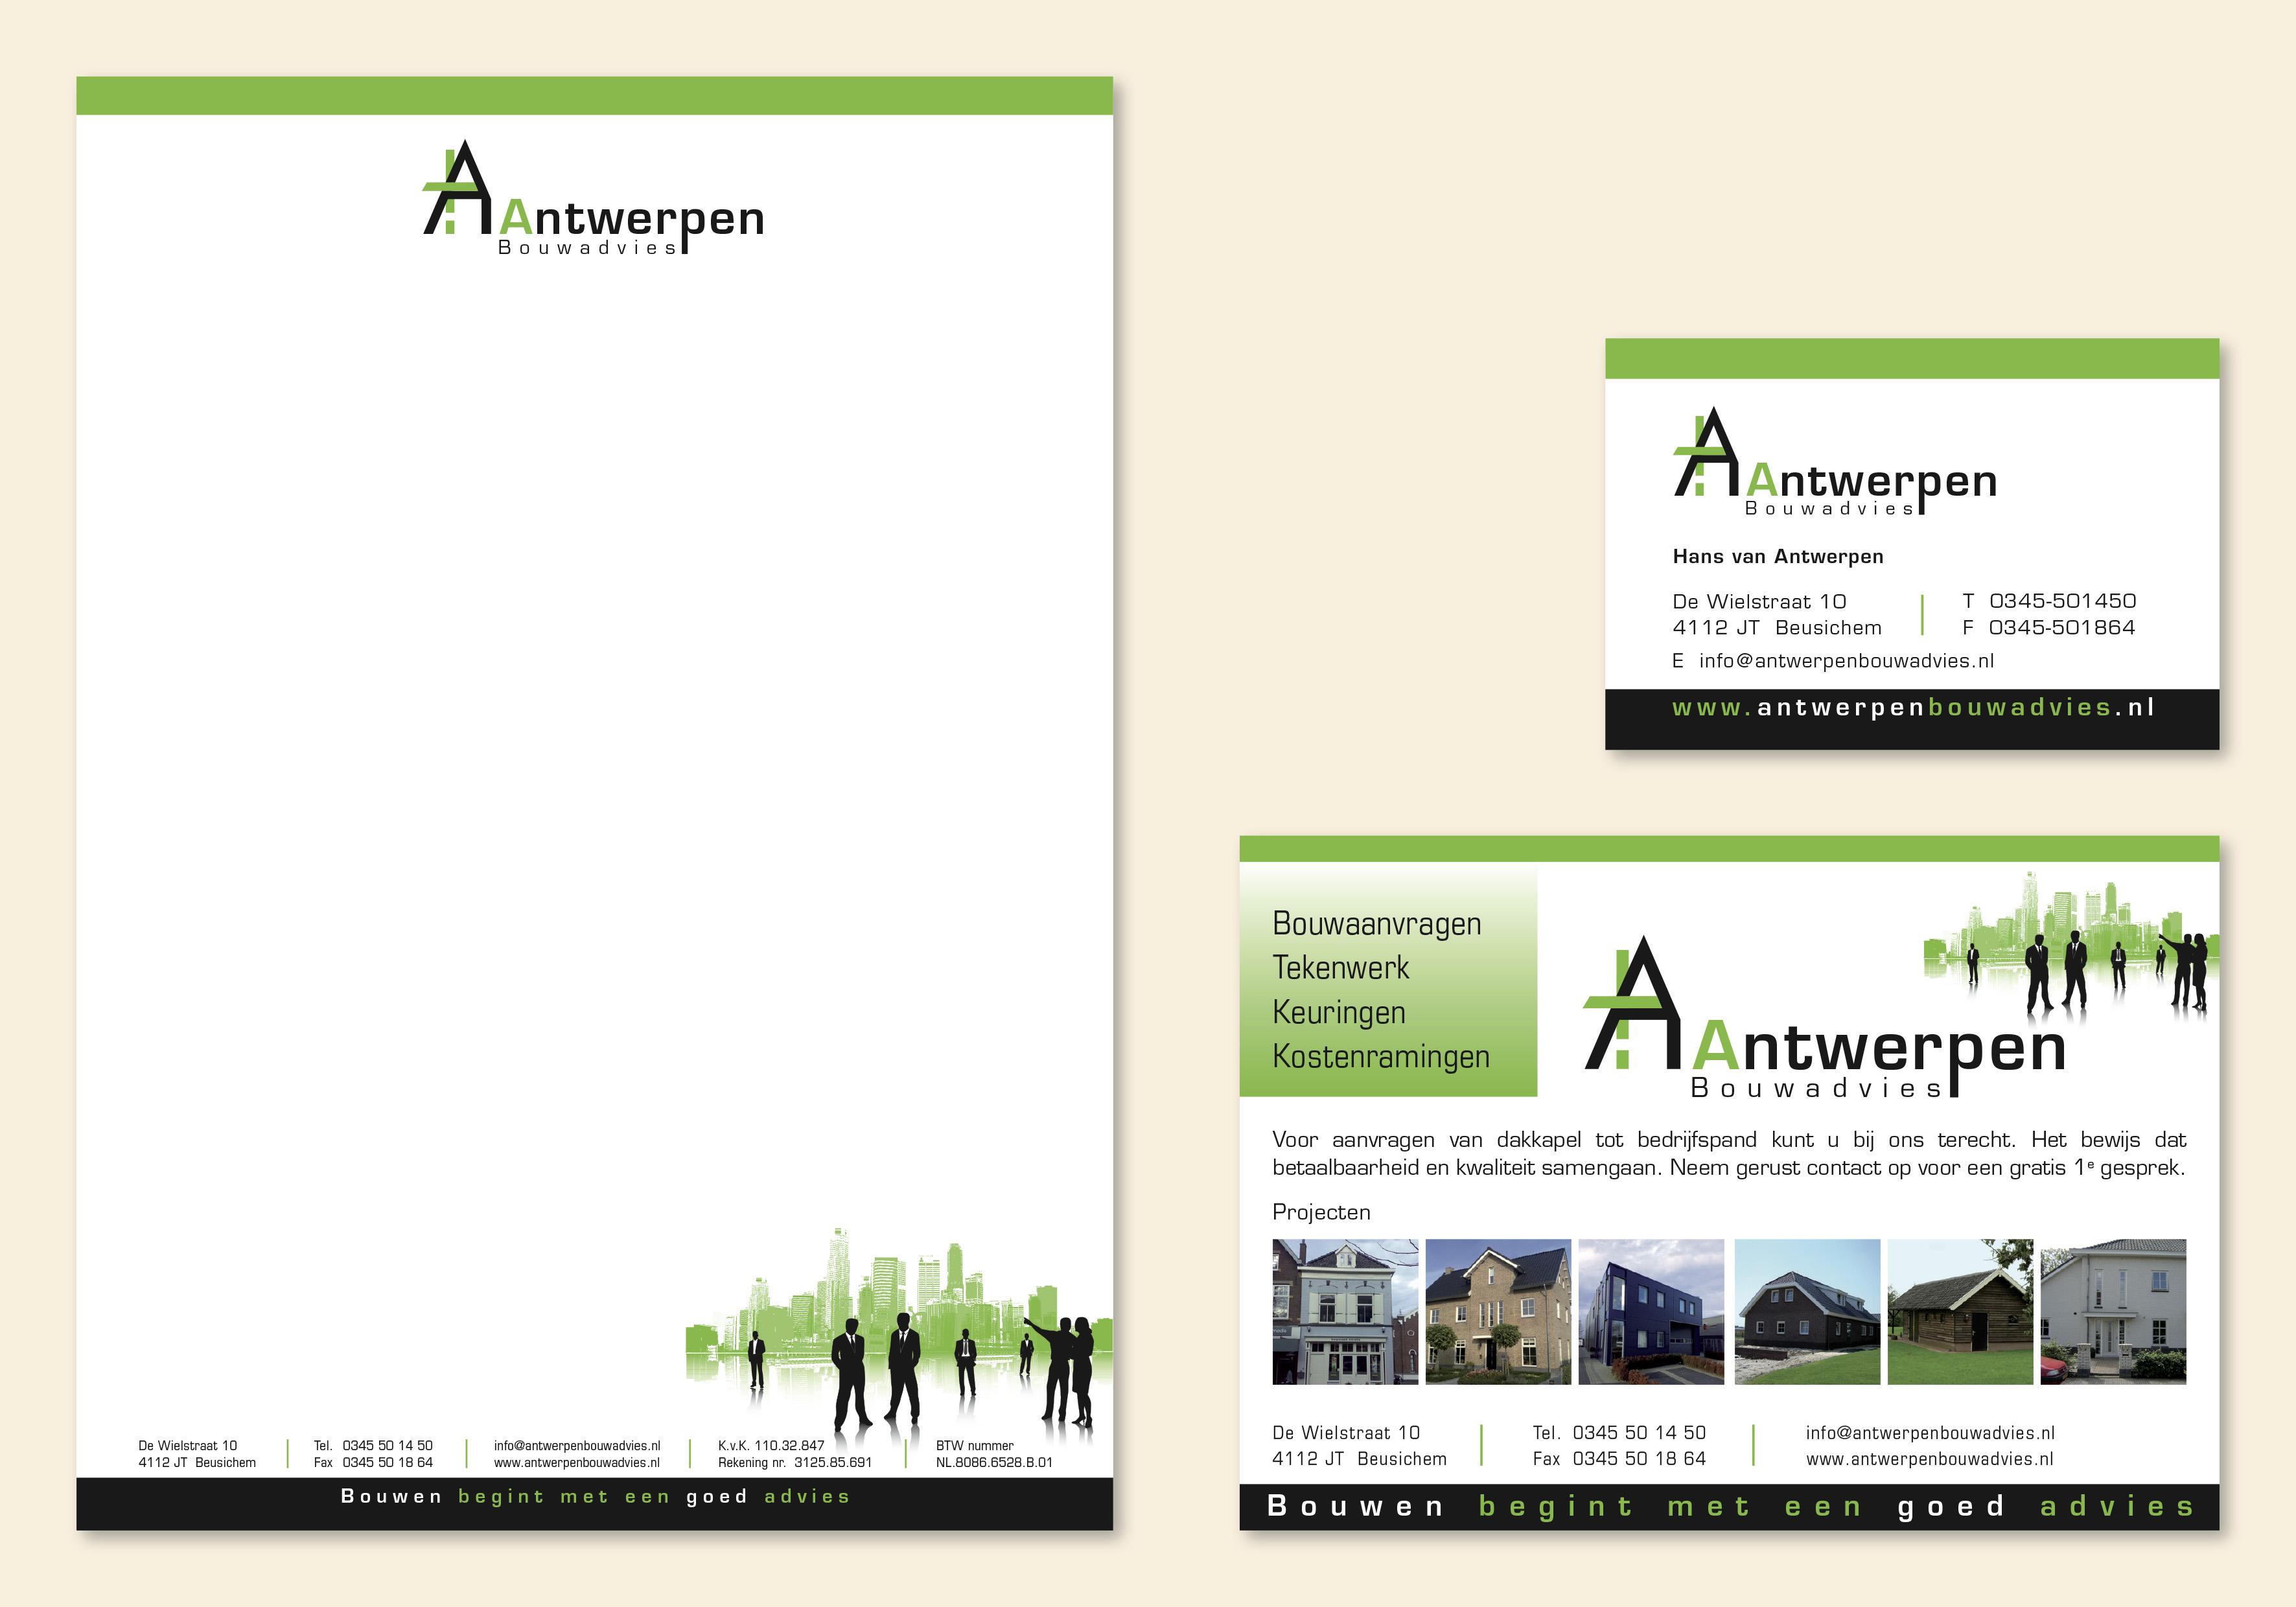 Antwerpen Bouwadvies